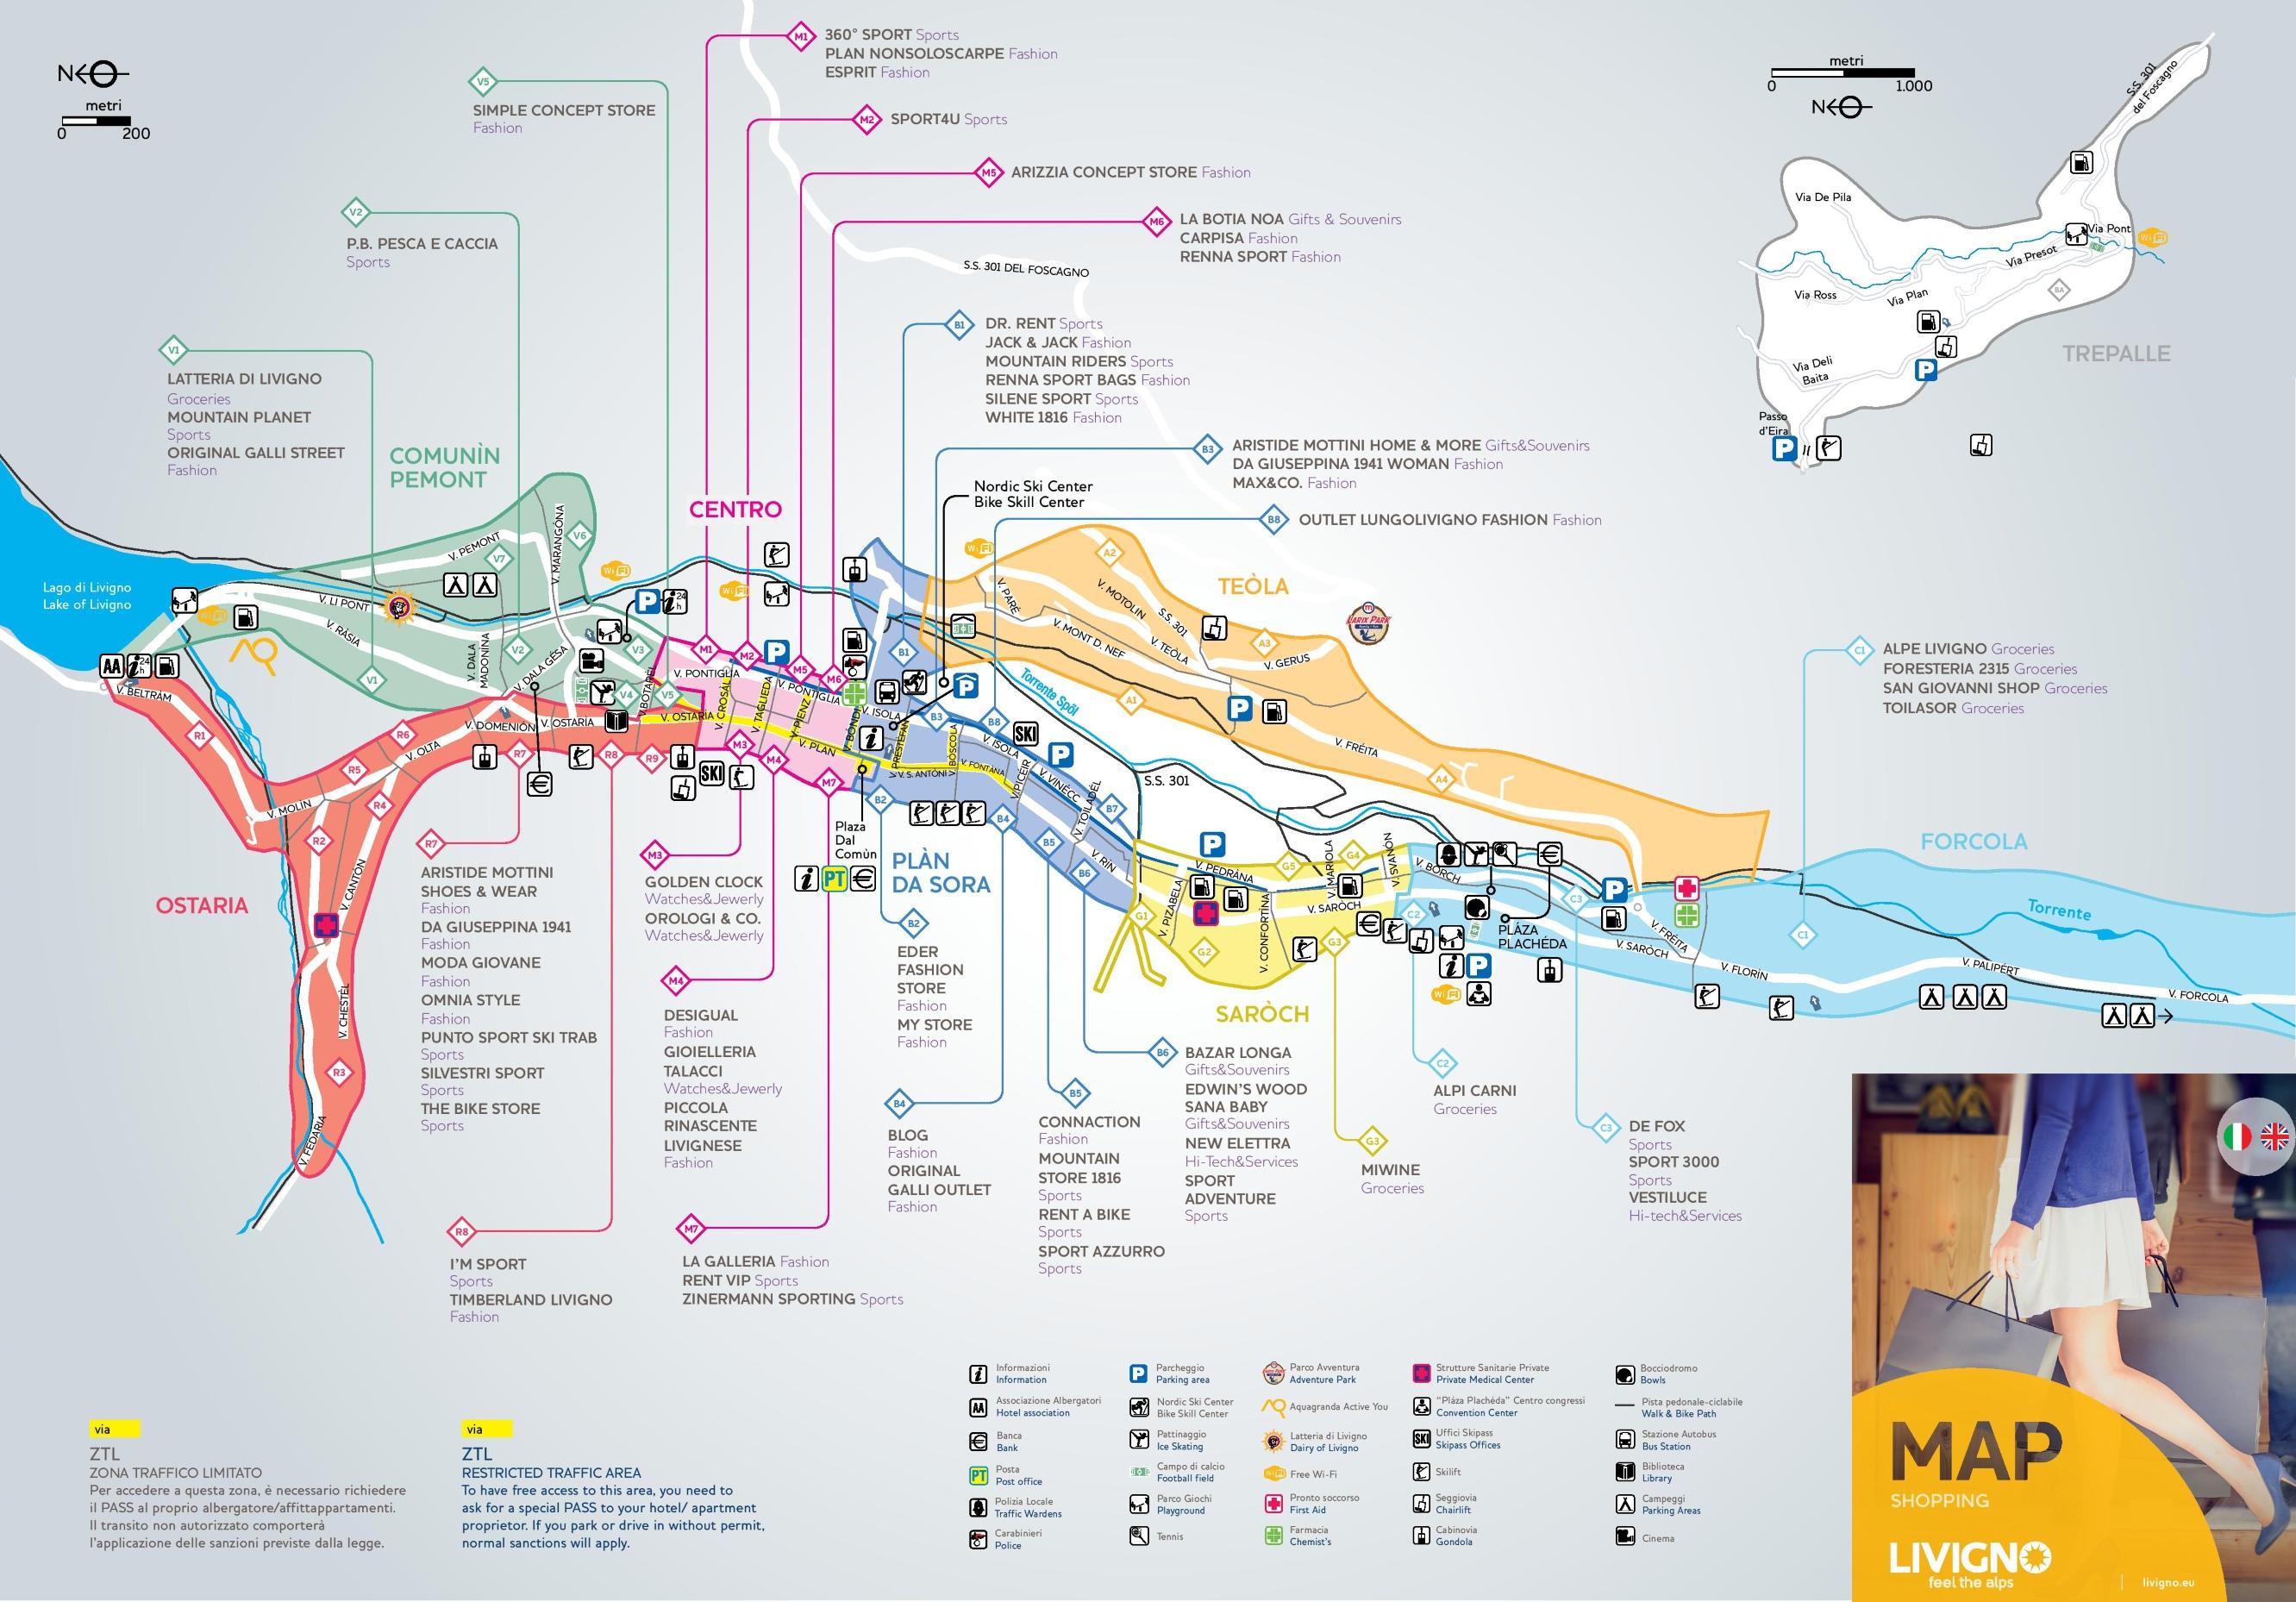 Livigno Maps Italy Maps of Livigno